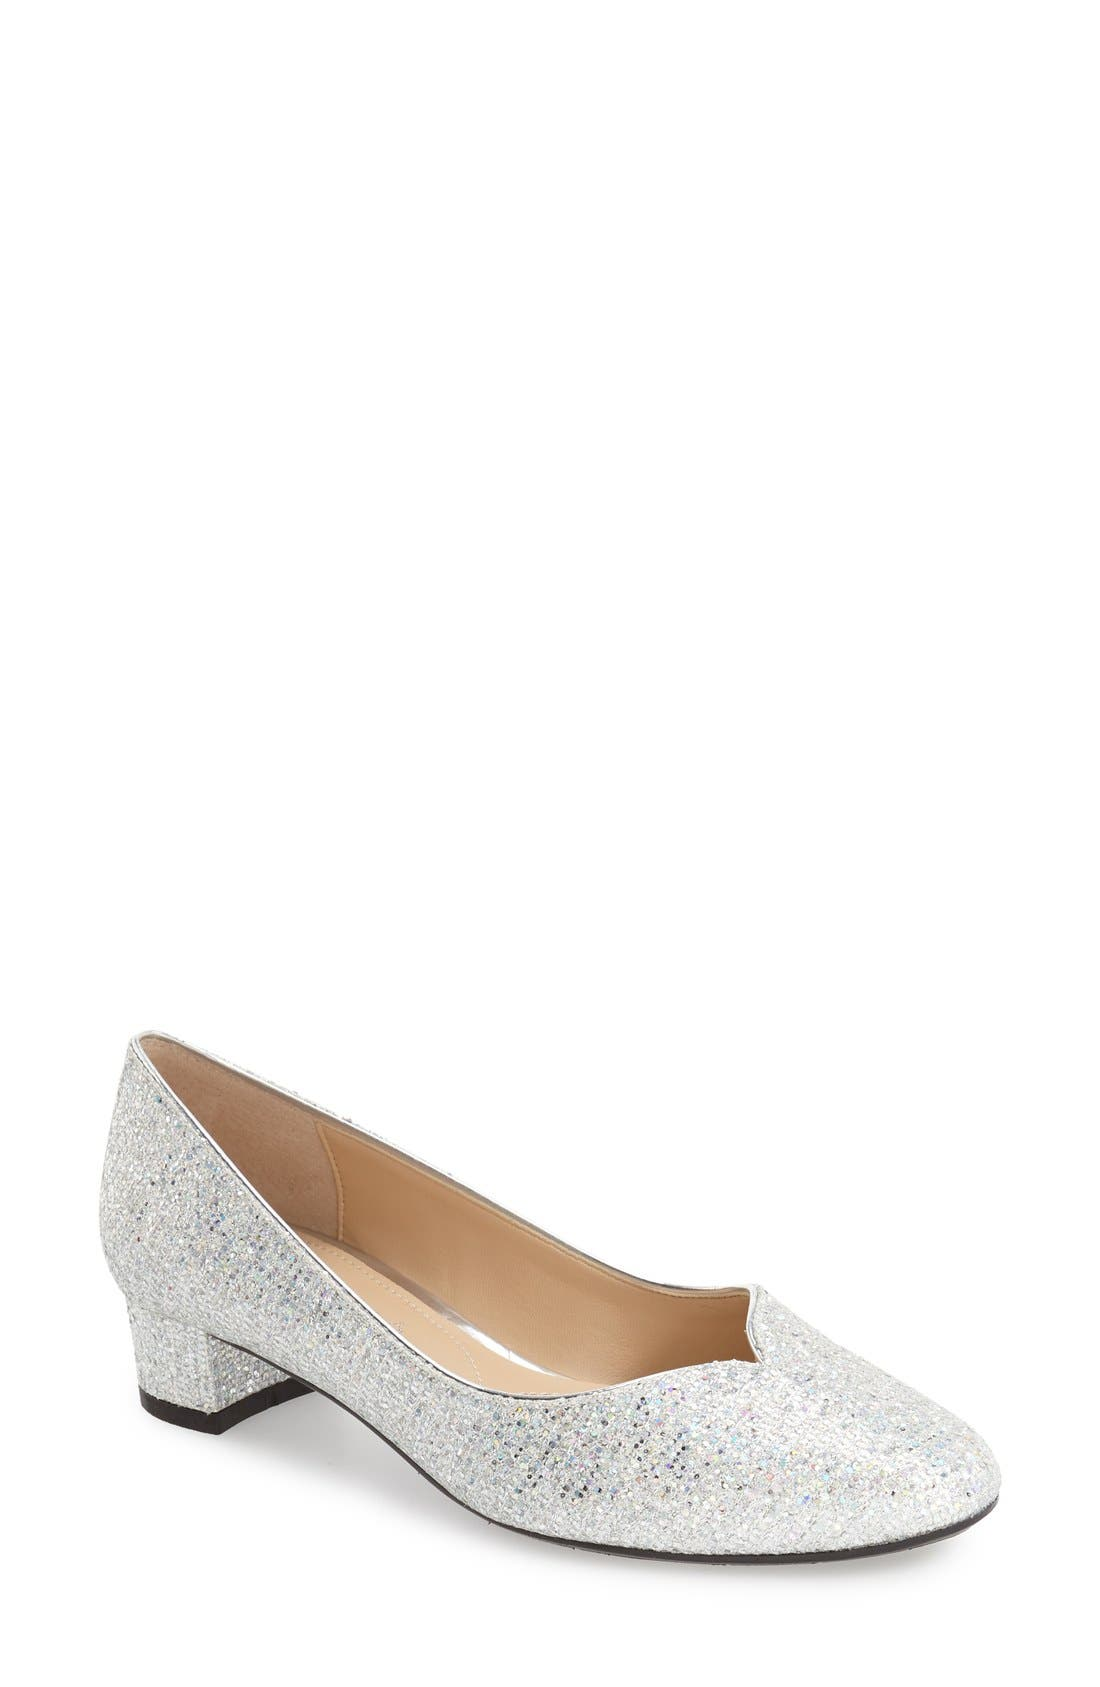 J. RENEÉ 'Bambalina' Block Heel Glitter Pump, Main, color, SILVER GLITTER FABRIC